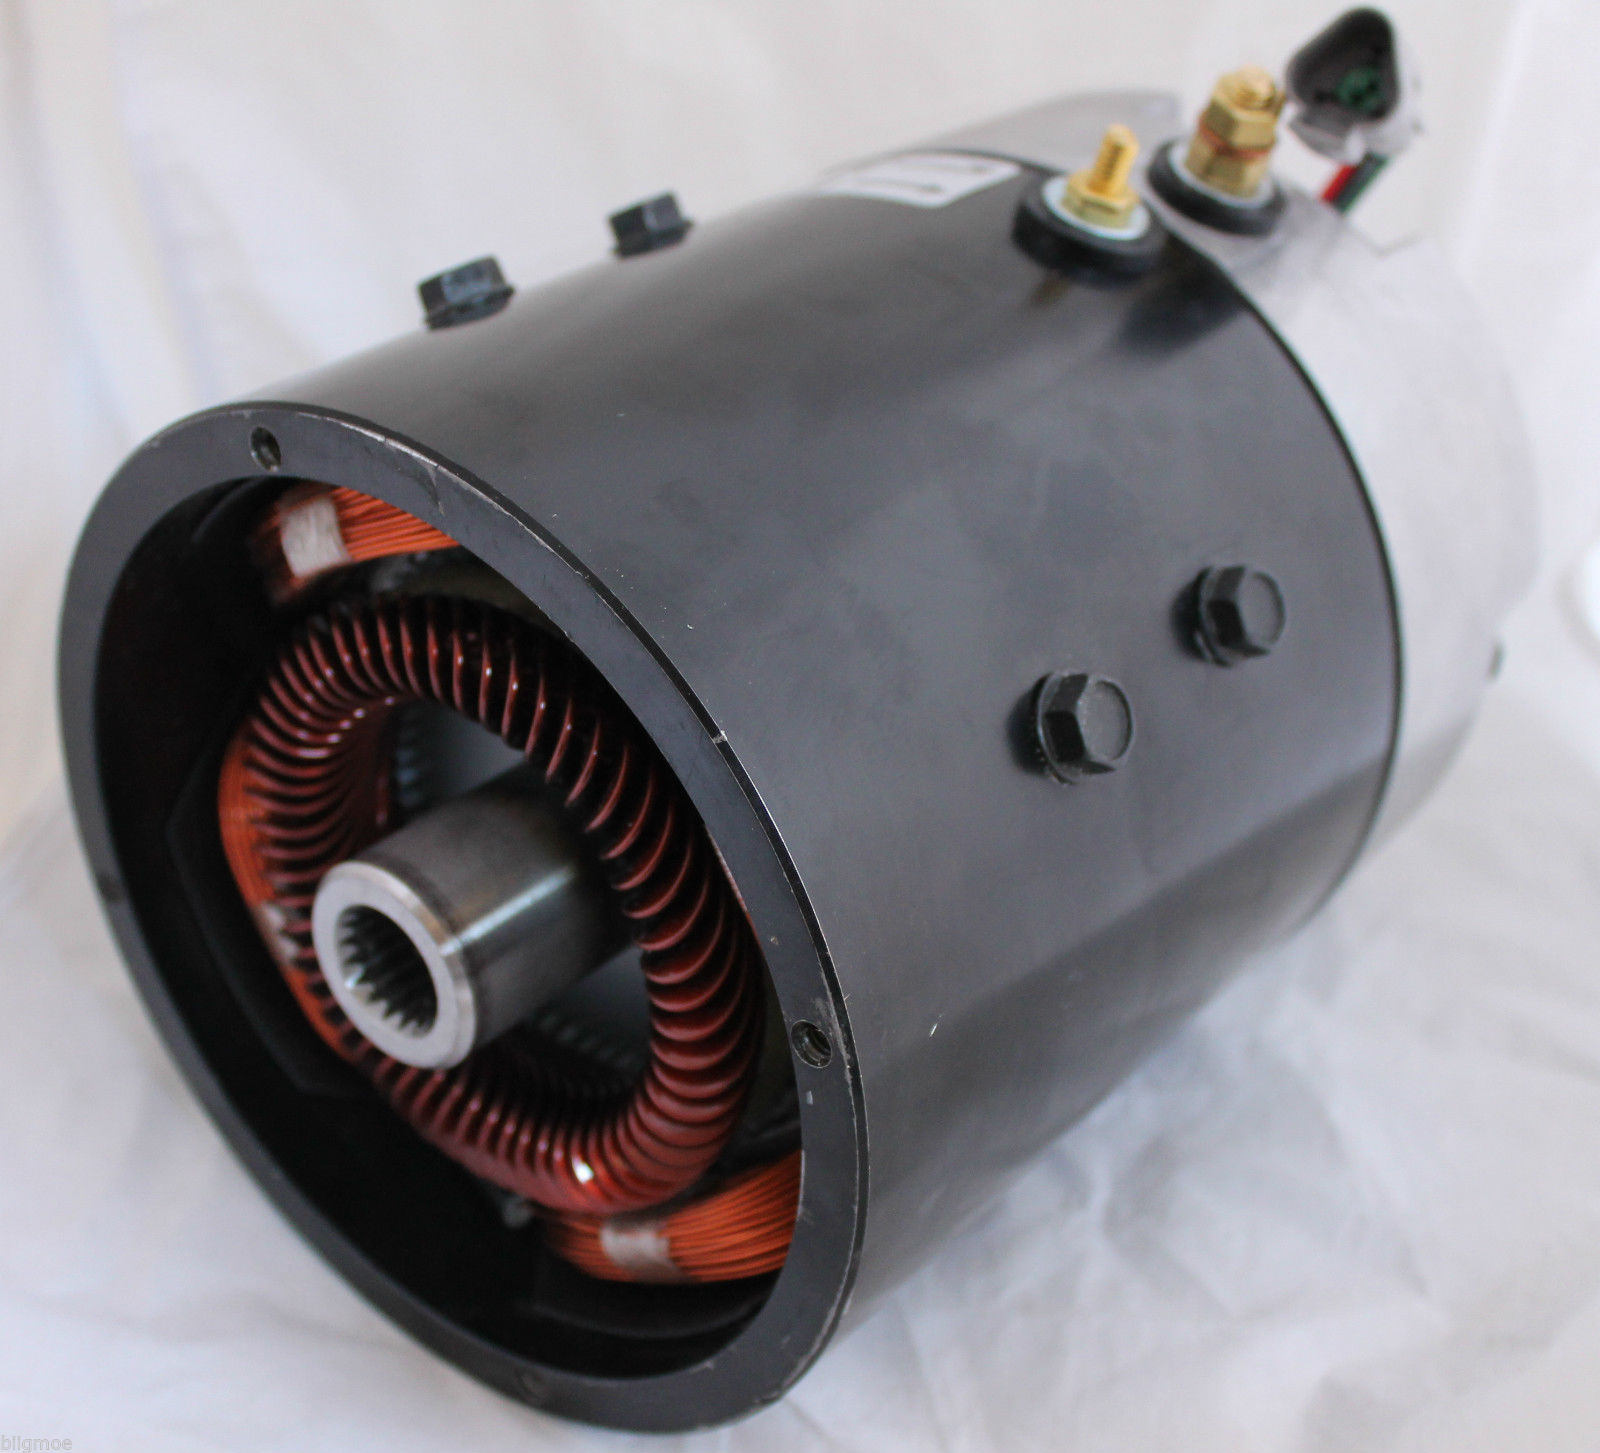 Ezgo Pds Dcs Advanced Motors 36 48 Volt Golf And 50 Similar Items Cart Wiring Controller Motor Ev6